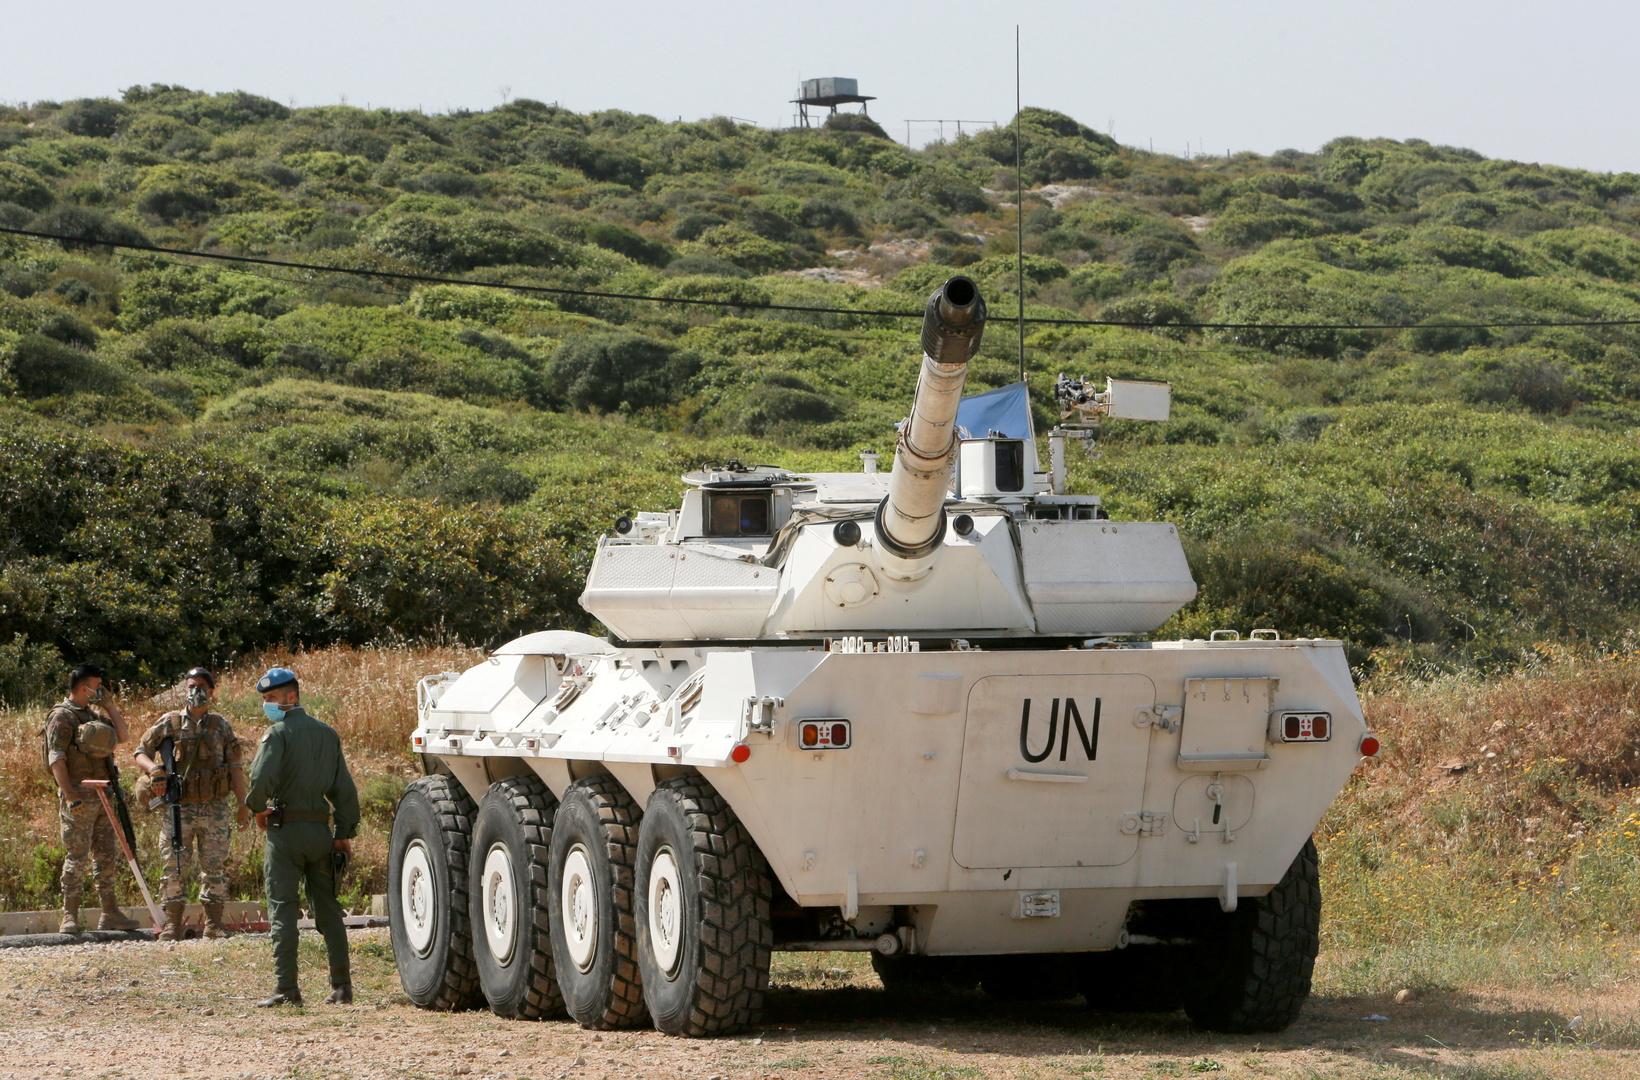 اجتماع استثنائي بين ضباط لبنانيين وإسرائيليين كبار تحت رعاية